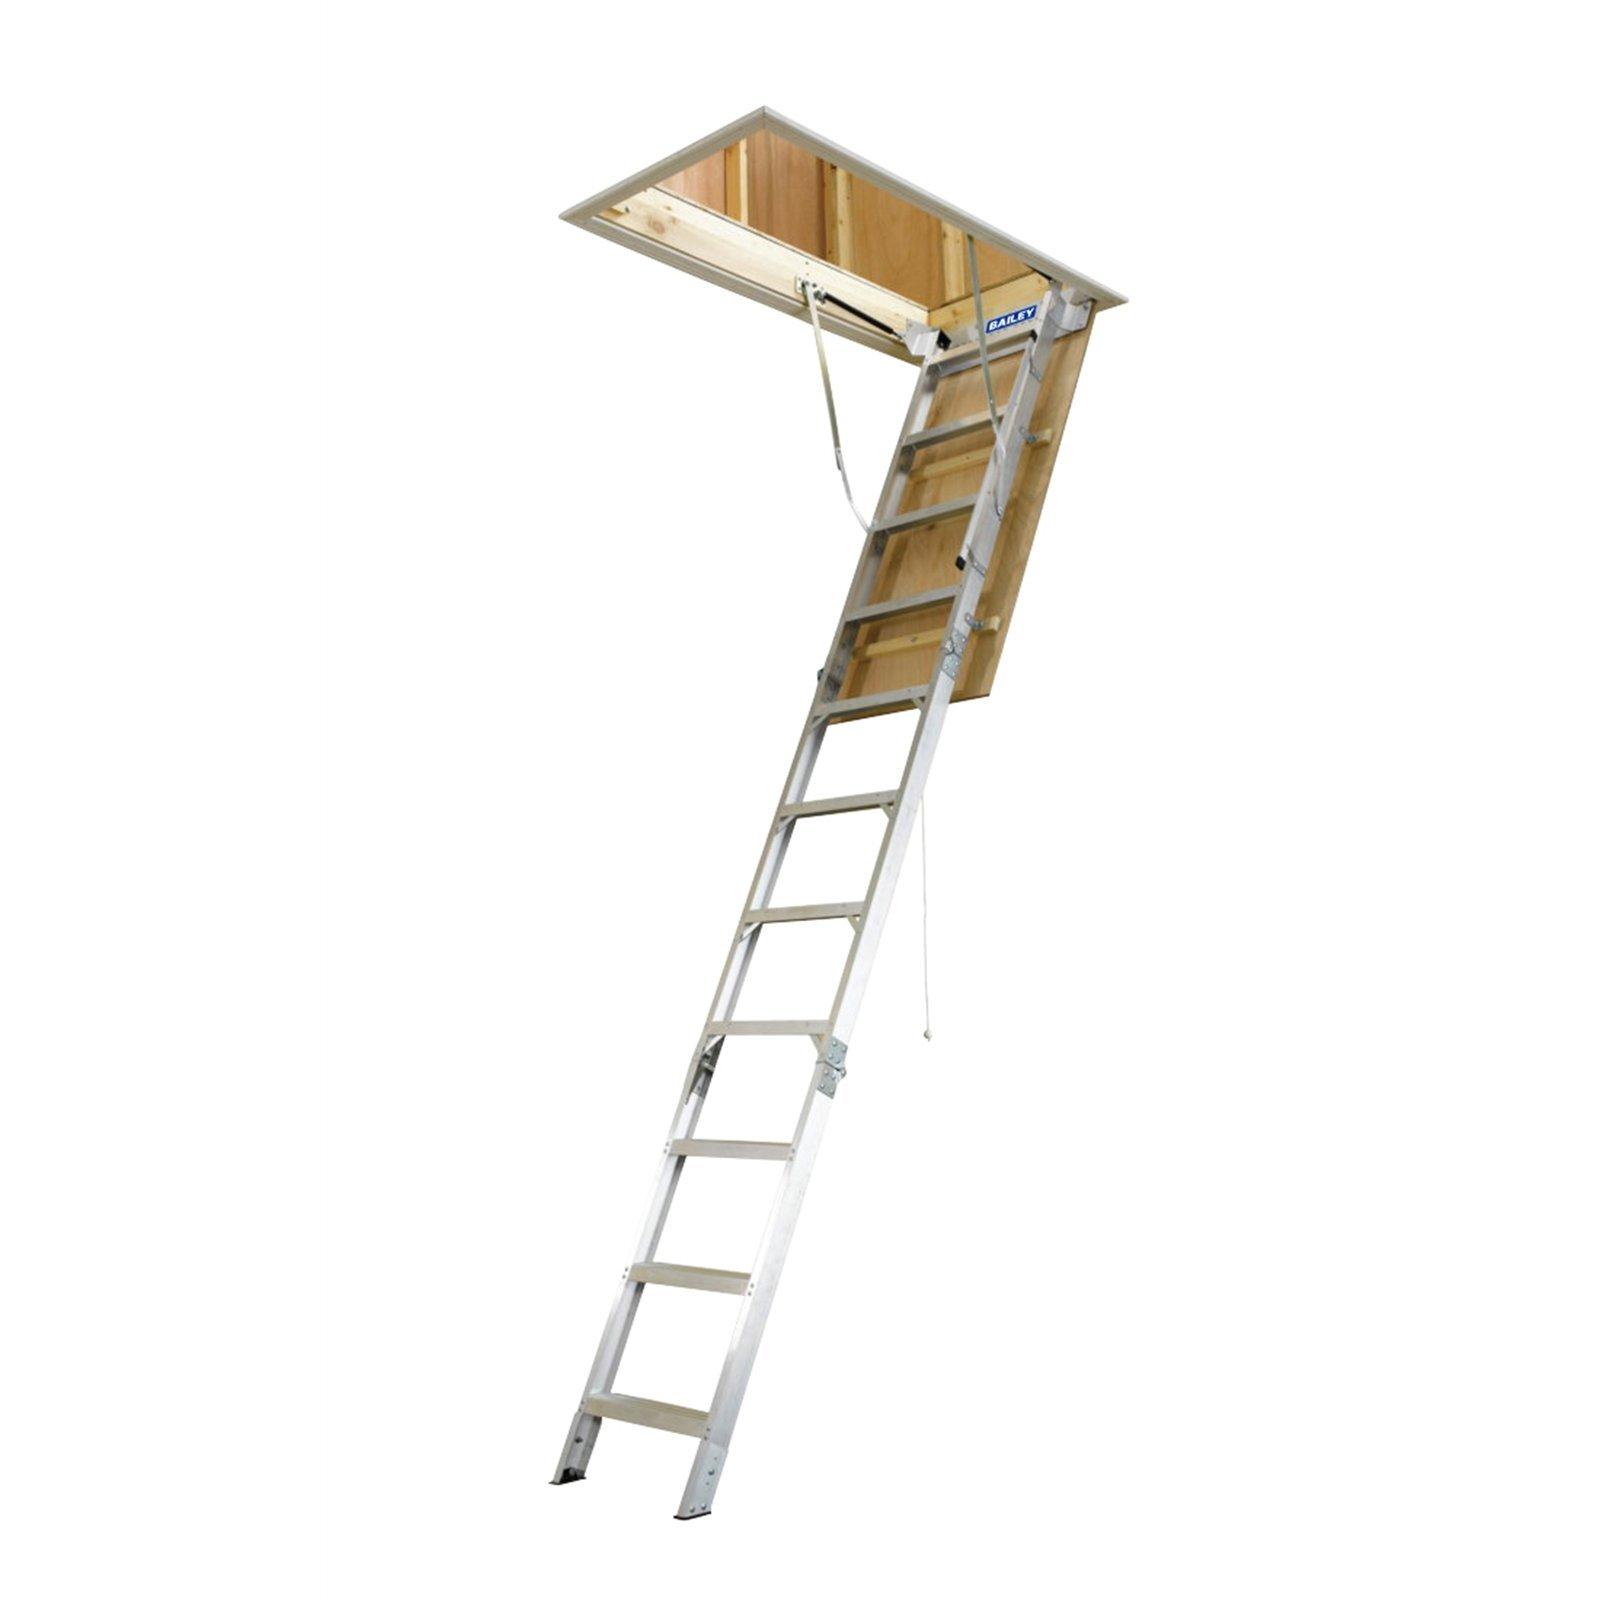 Bailey 2.34 - 3.12m 170kg Aluminium Folding Attic Ladder